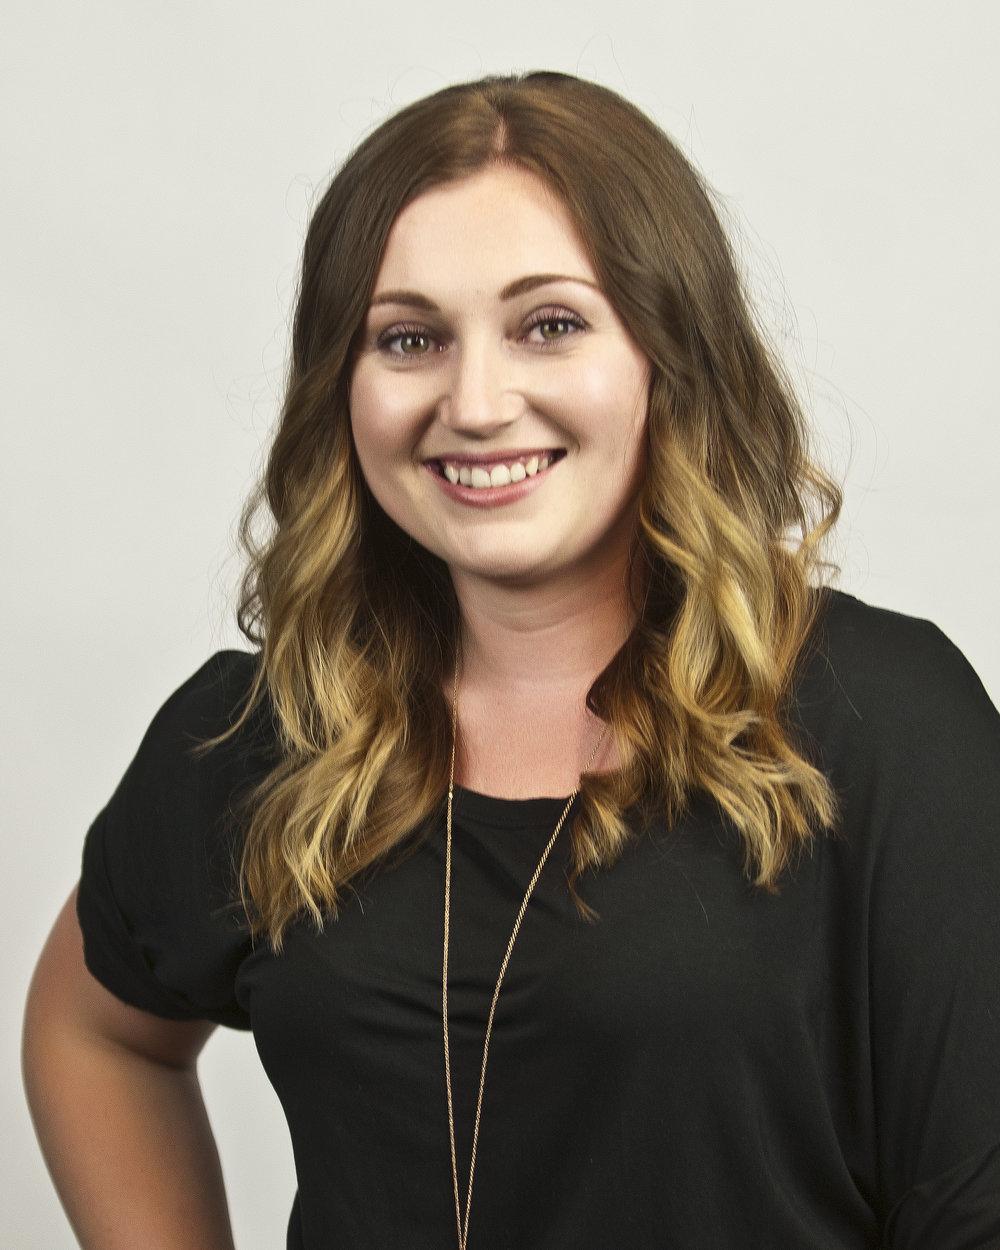 Amanda Brooks |Board Vice President |Marketing Account Manager: Marketing, Interactive & Creative Services Division @ 24Seven